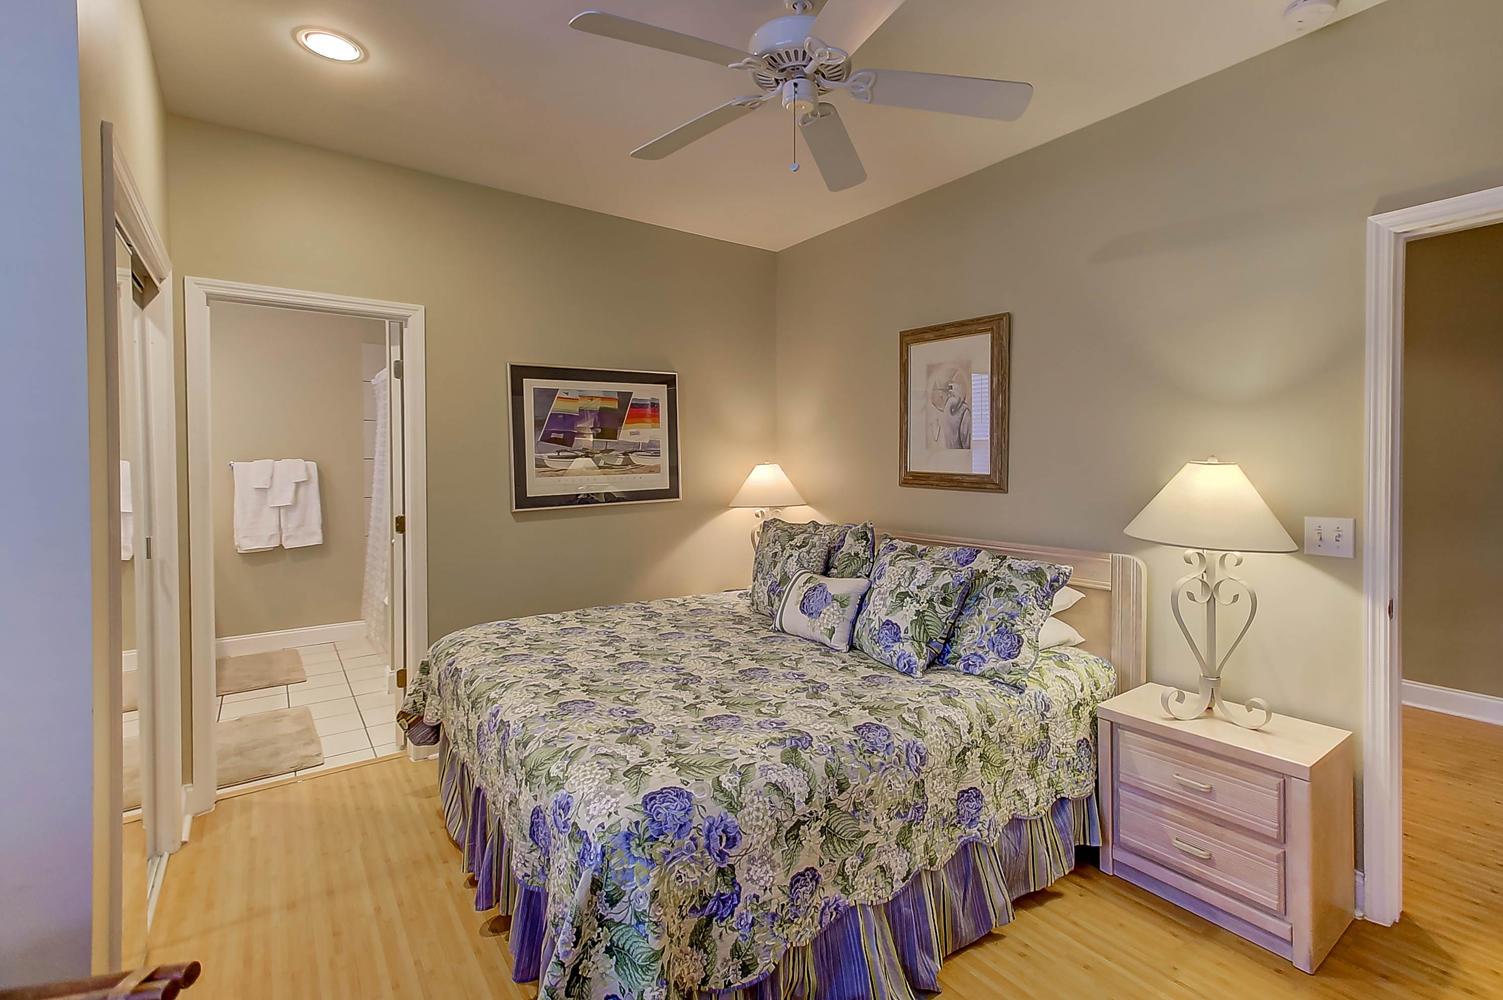 Beachwalker Villas Homes For Sale - 108 Ashley, Folly Beach, SC - 11